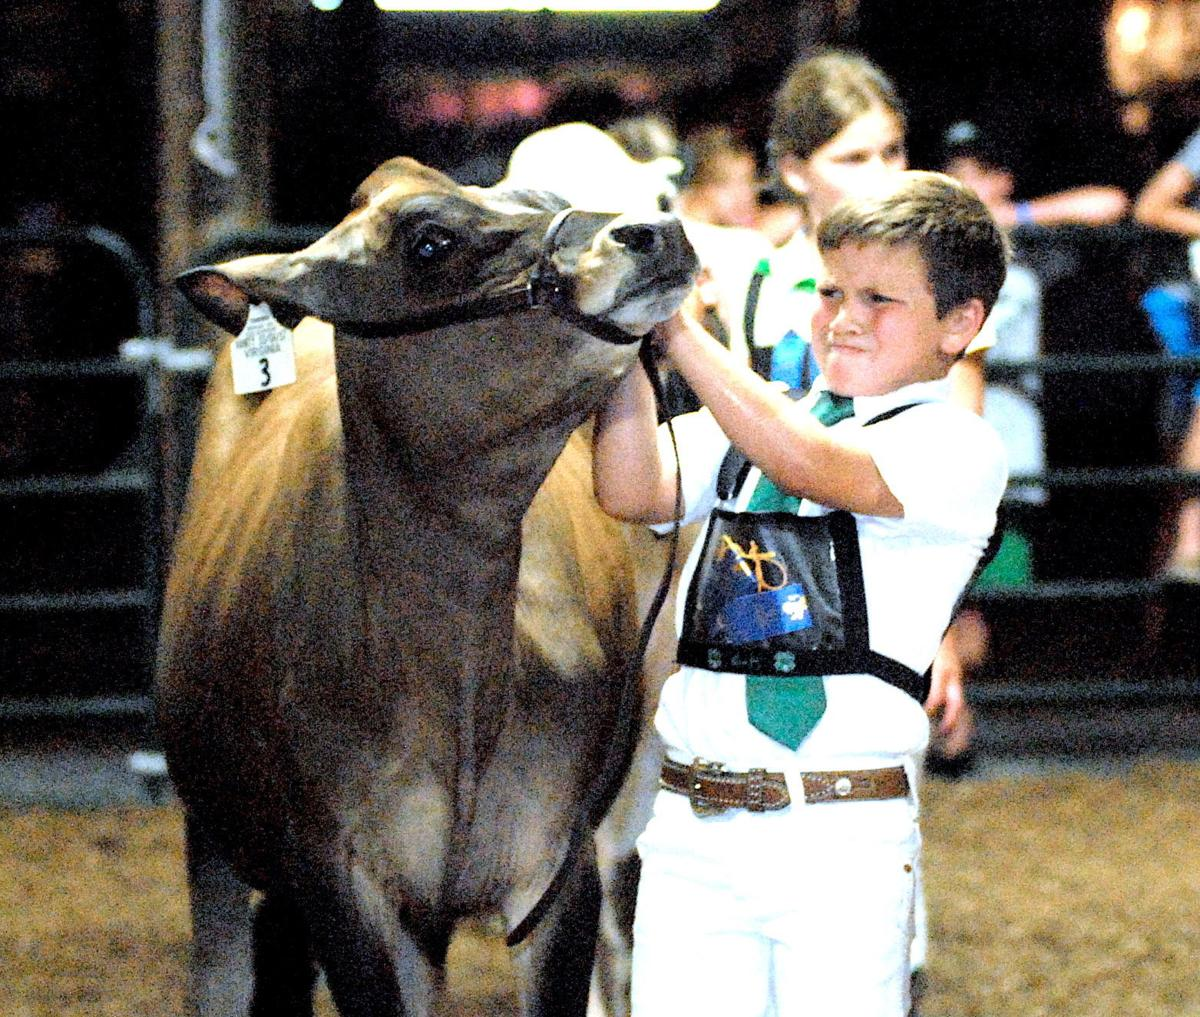 Talbot County Fair begins Thursday